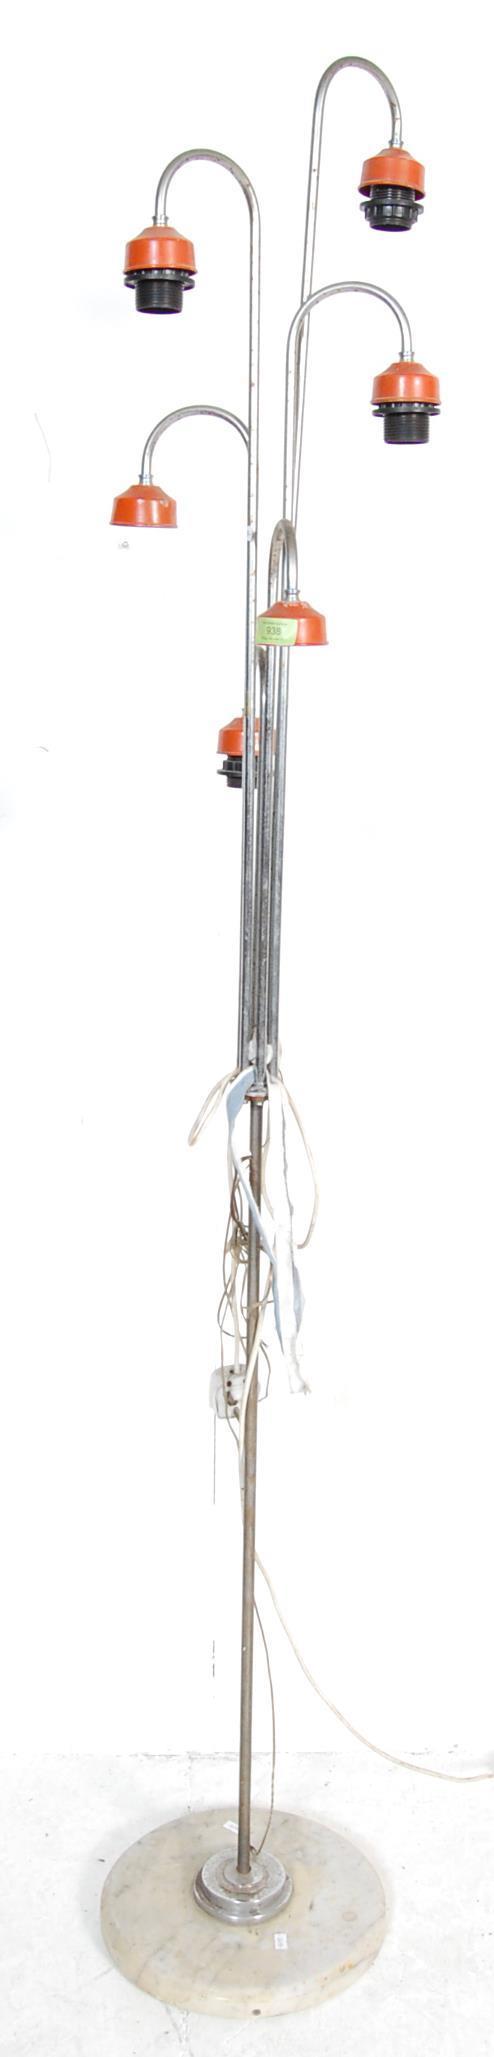 RETRO VINTAGE MID 20TH CENTURY STANDARD LAMPS